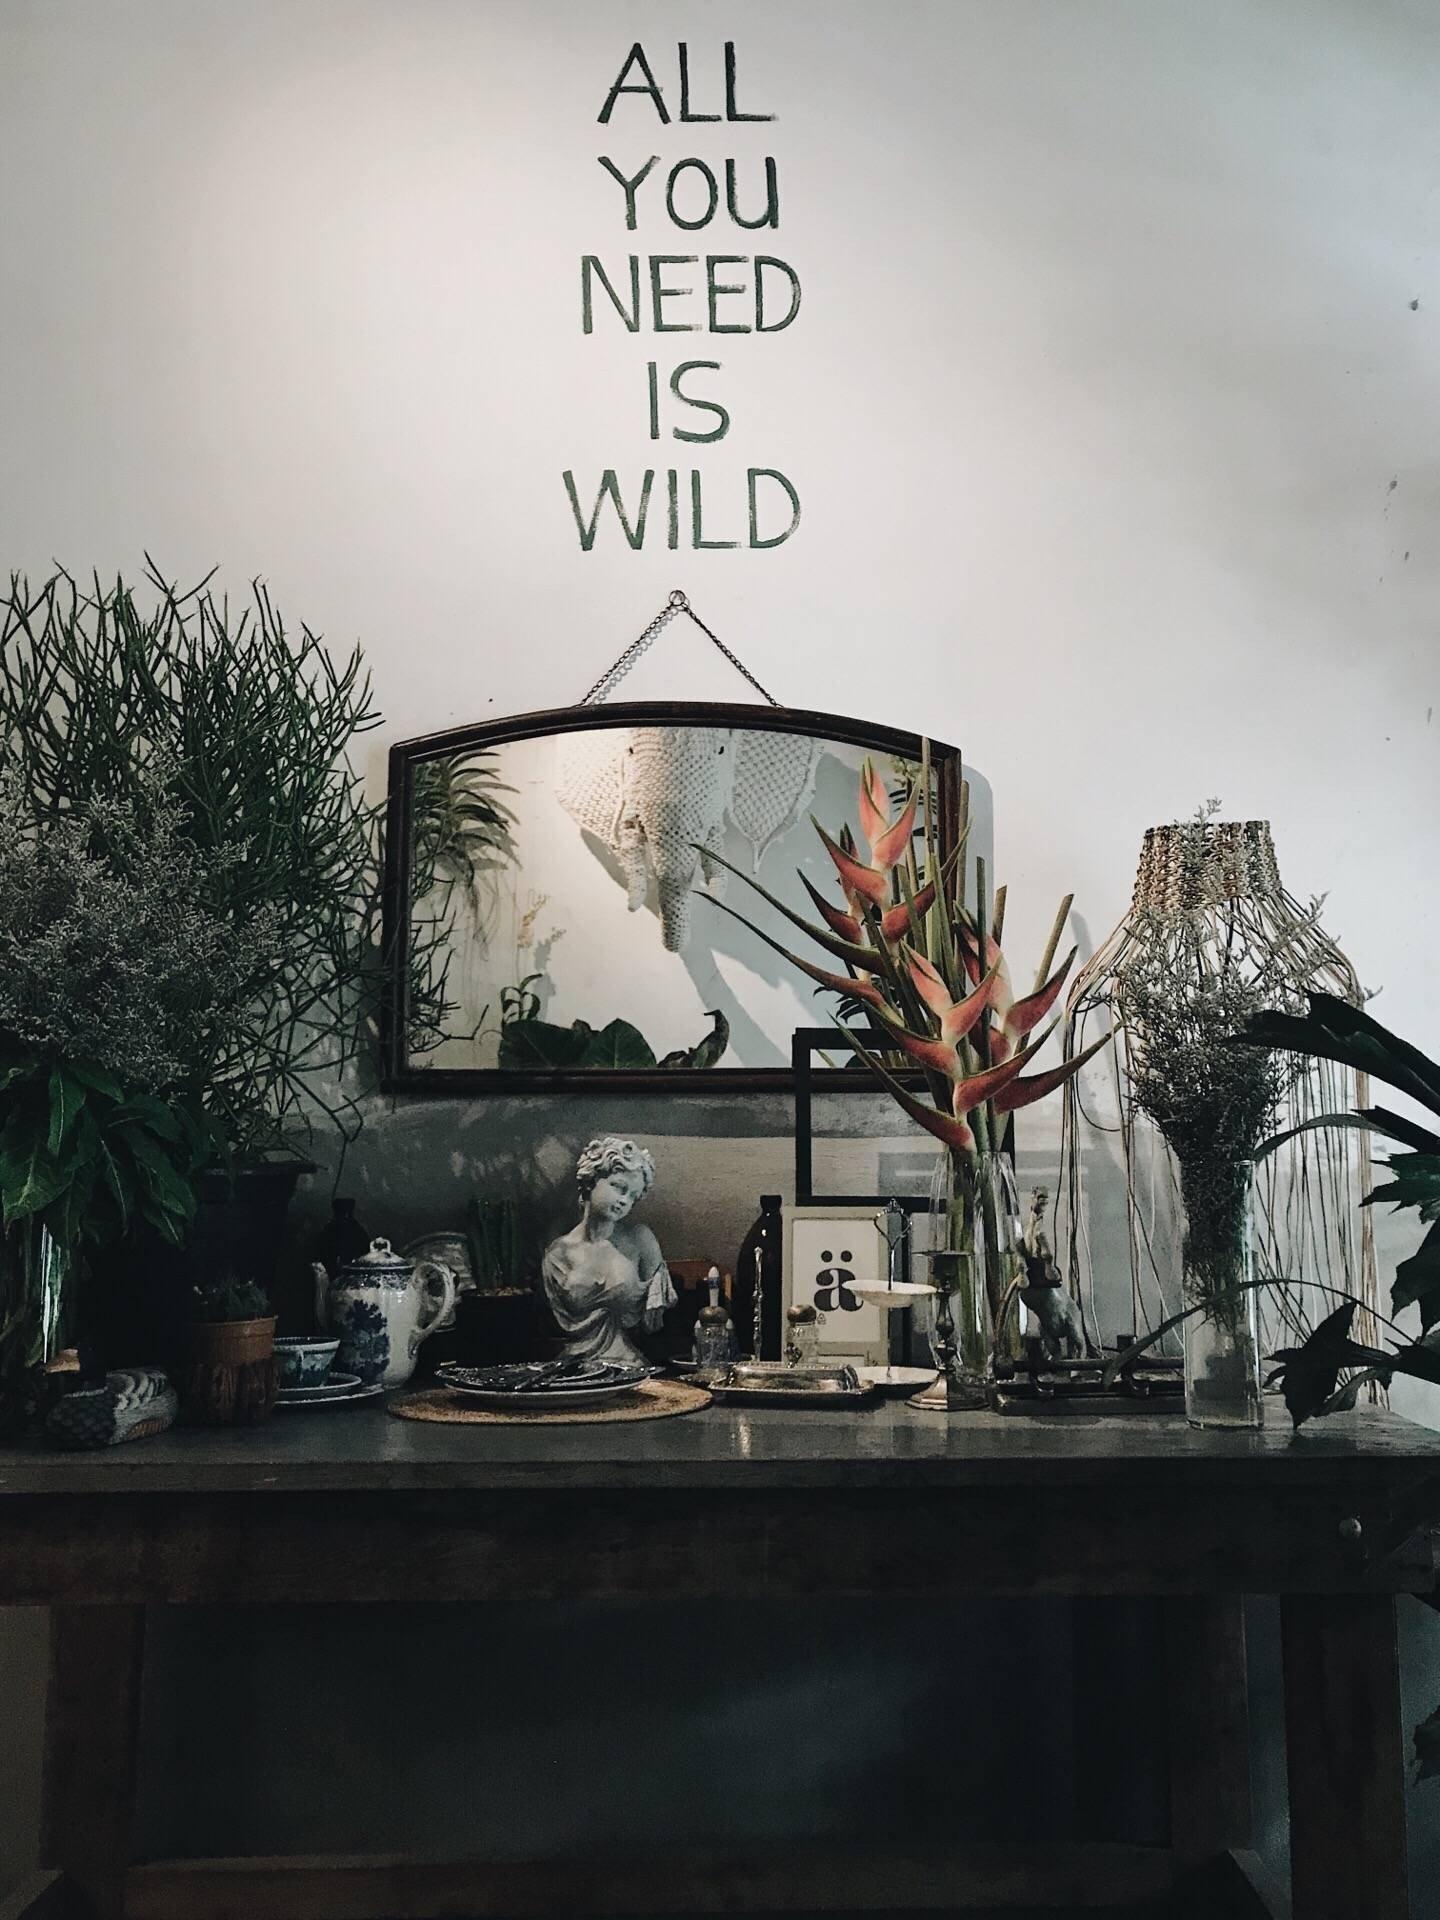 Botanica cafe